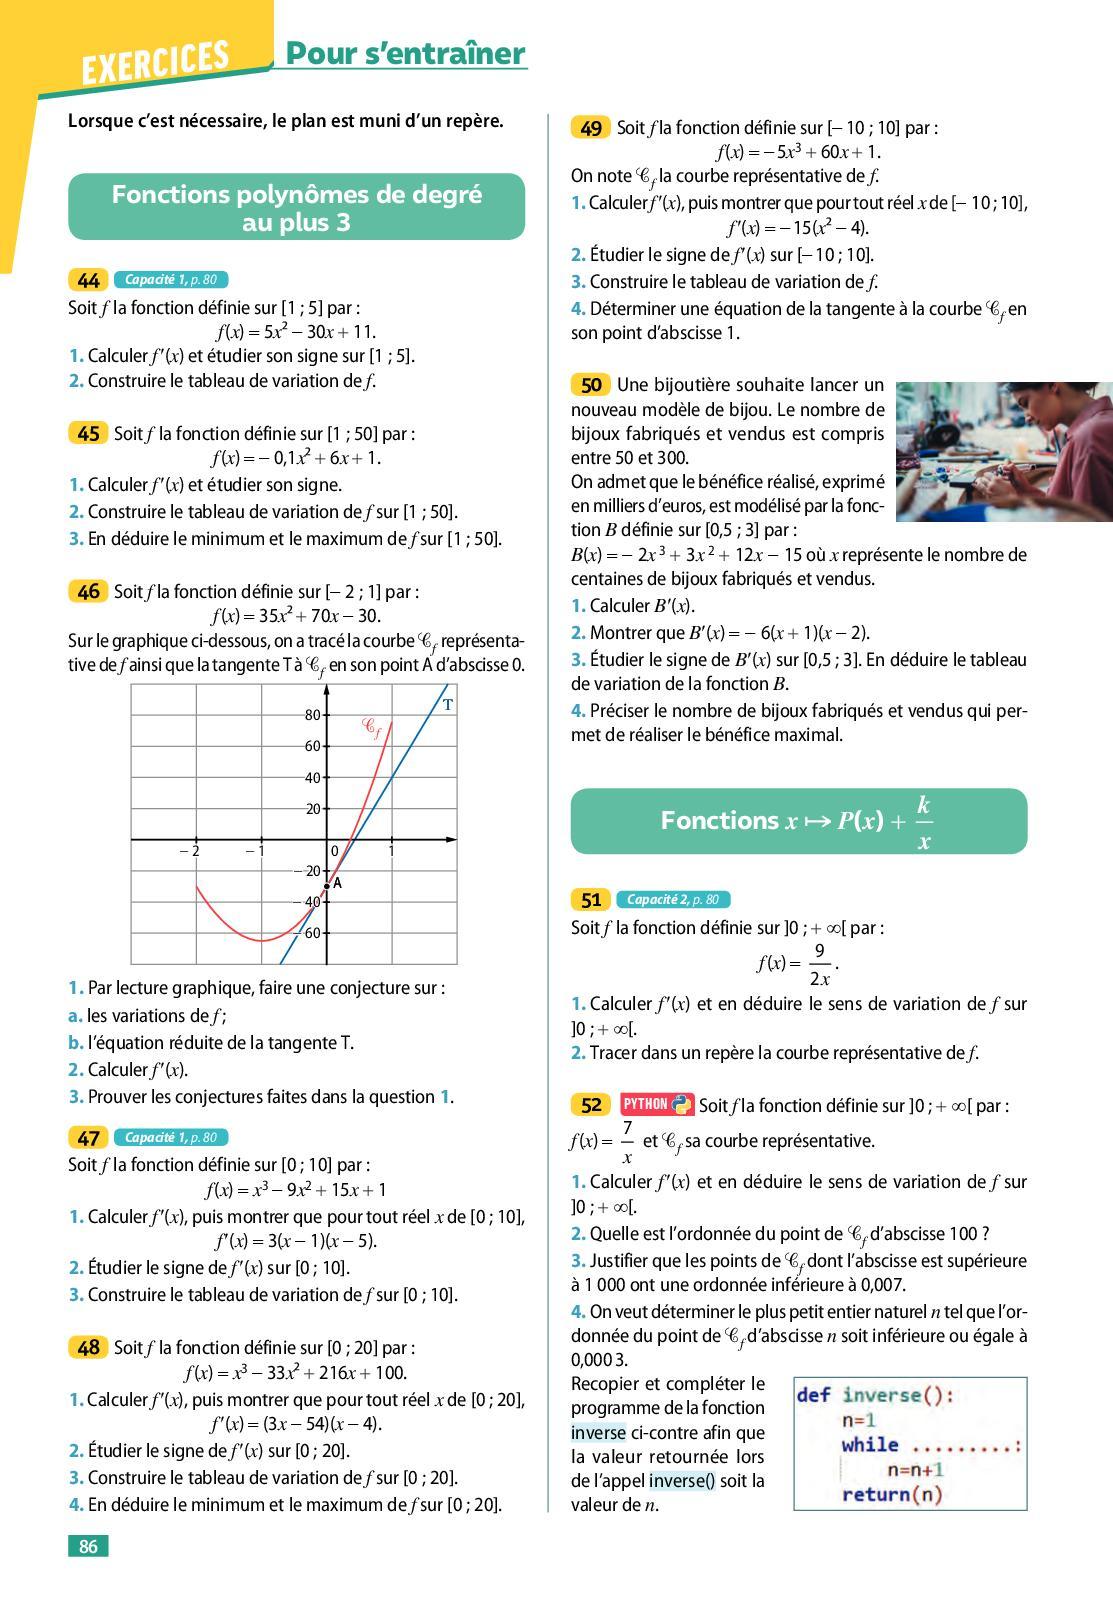 Indice Technologie Calameo Downloader